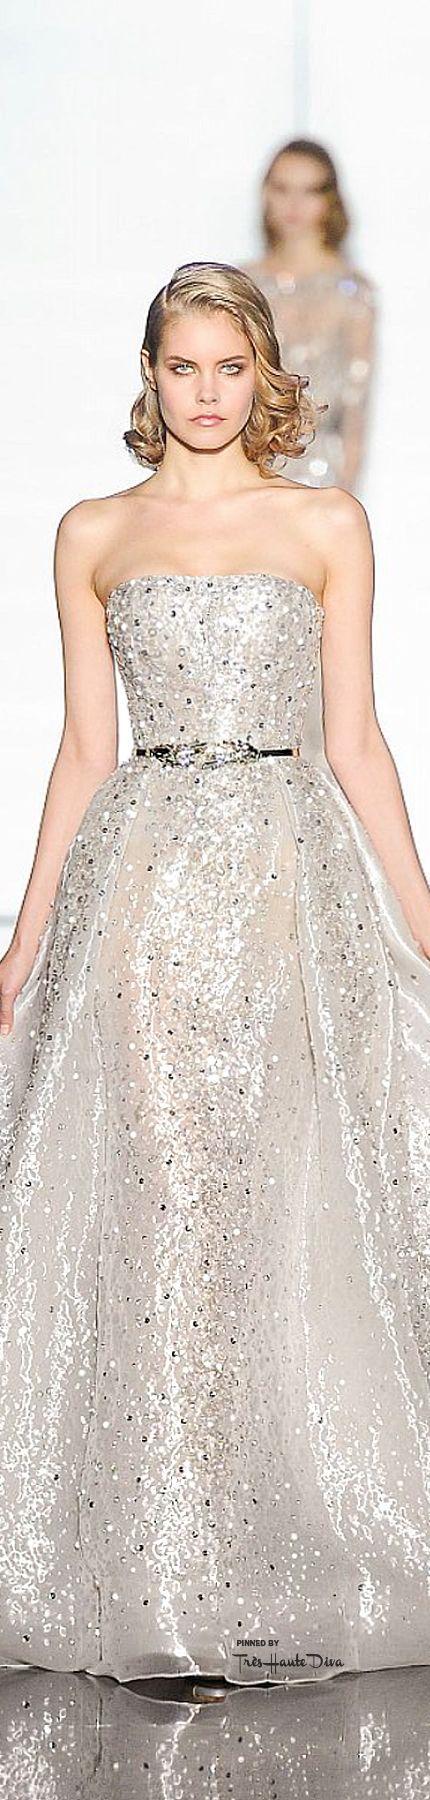 زفاف - Wedding Dresses From  2013   ❤️   2015. #1